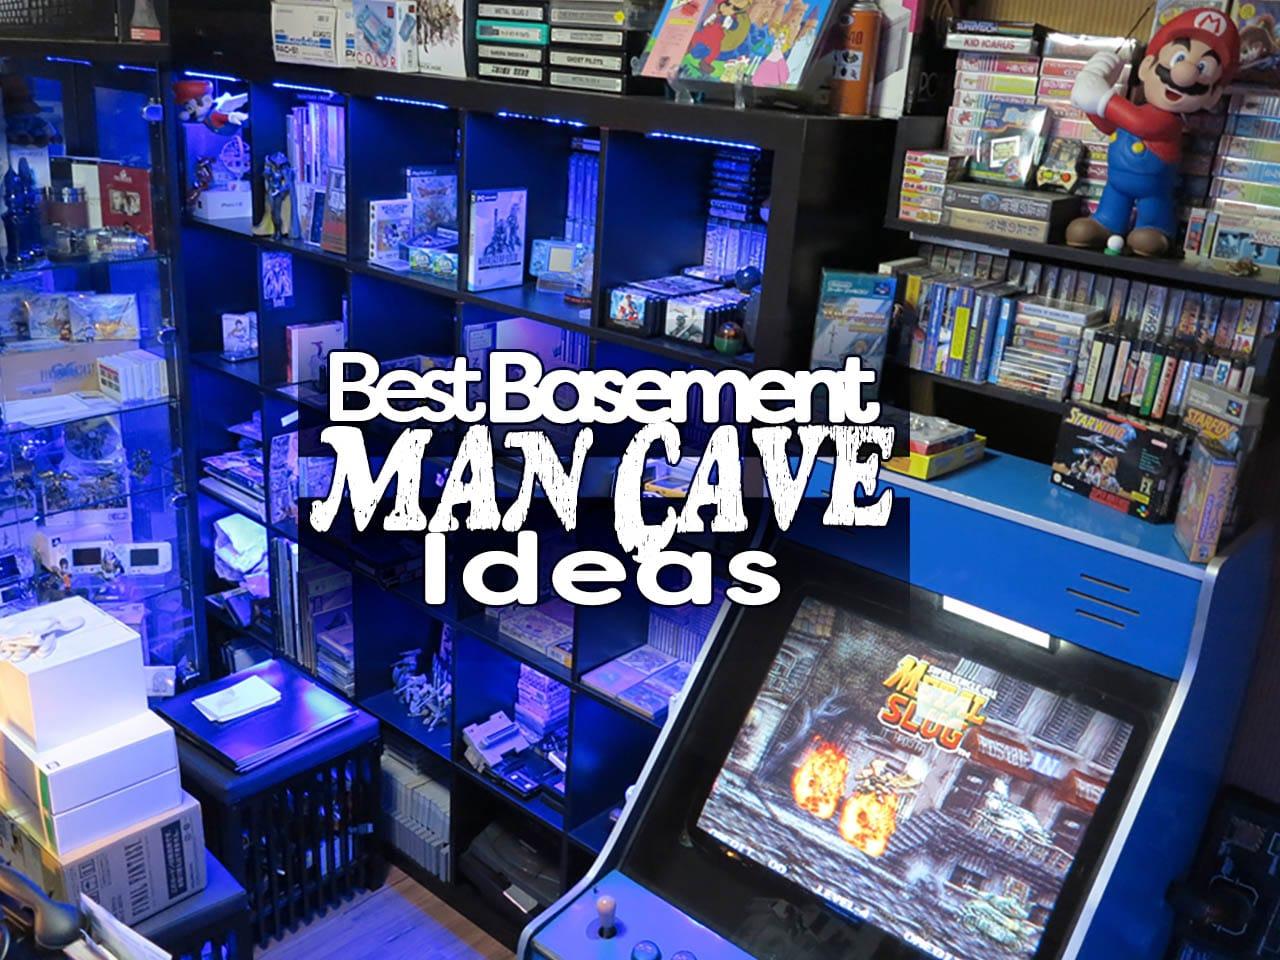 best basement man cave ideas feature